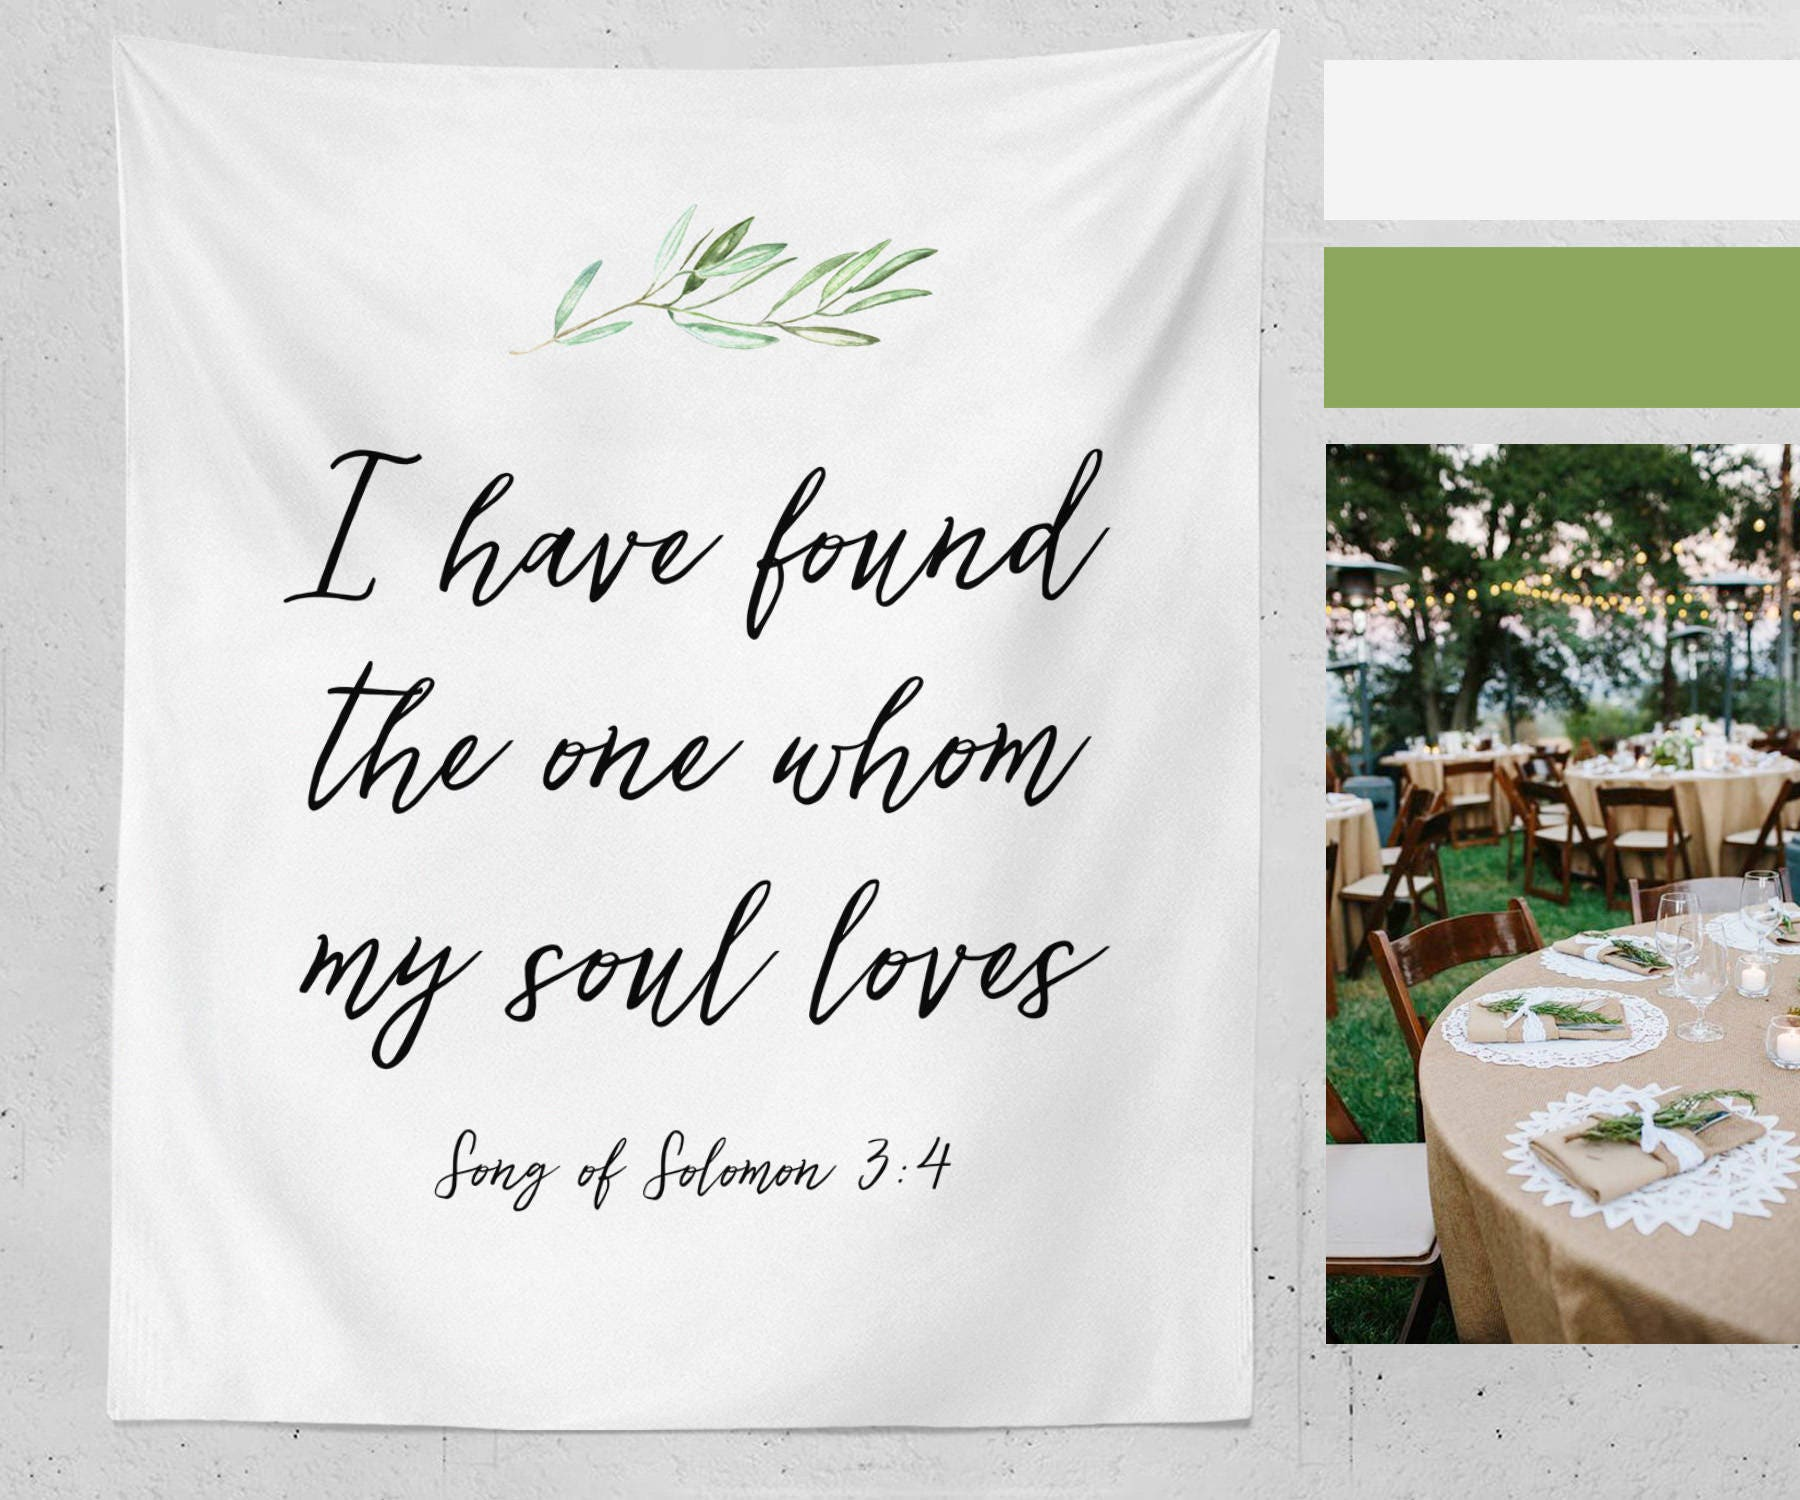 Christian Wedding Reception Ideas: I Have Found The One Whom My Soul Loves Fabric Banner Wedding